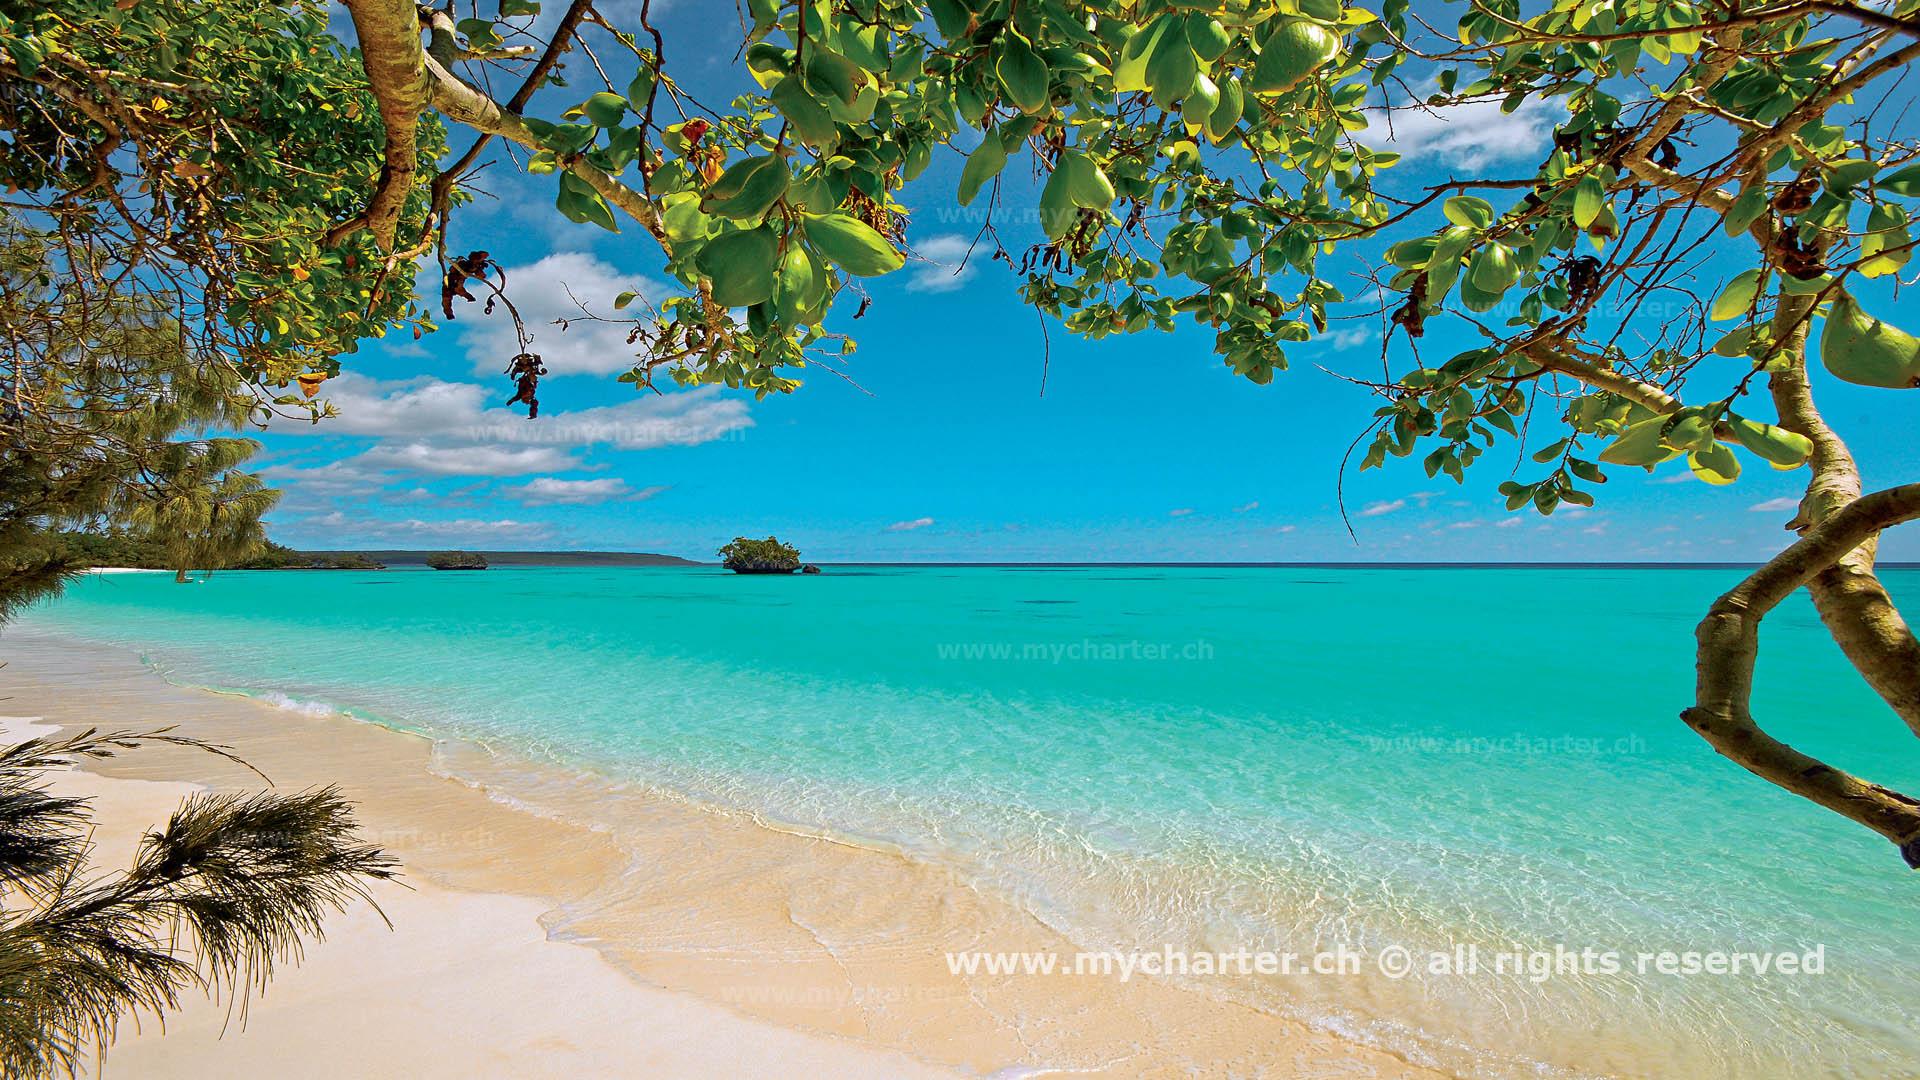 Yachtcharter Südesee - Neukaledonien - Ile Lifou